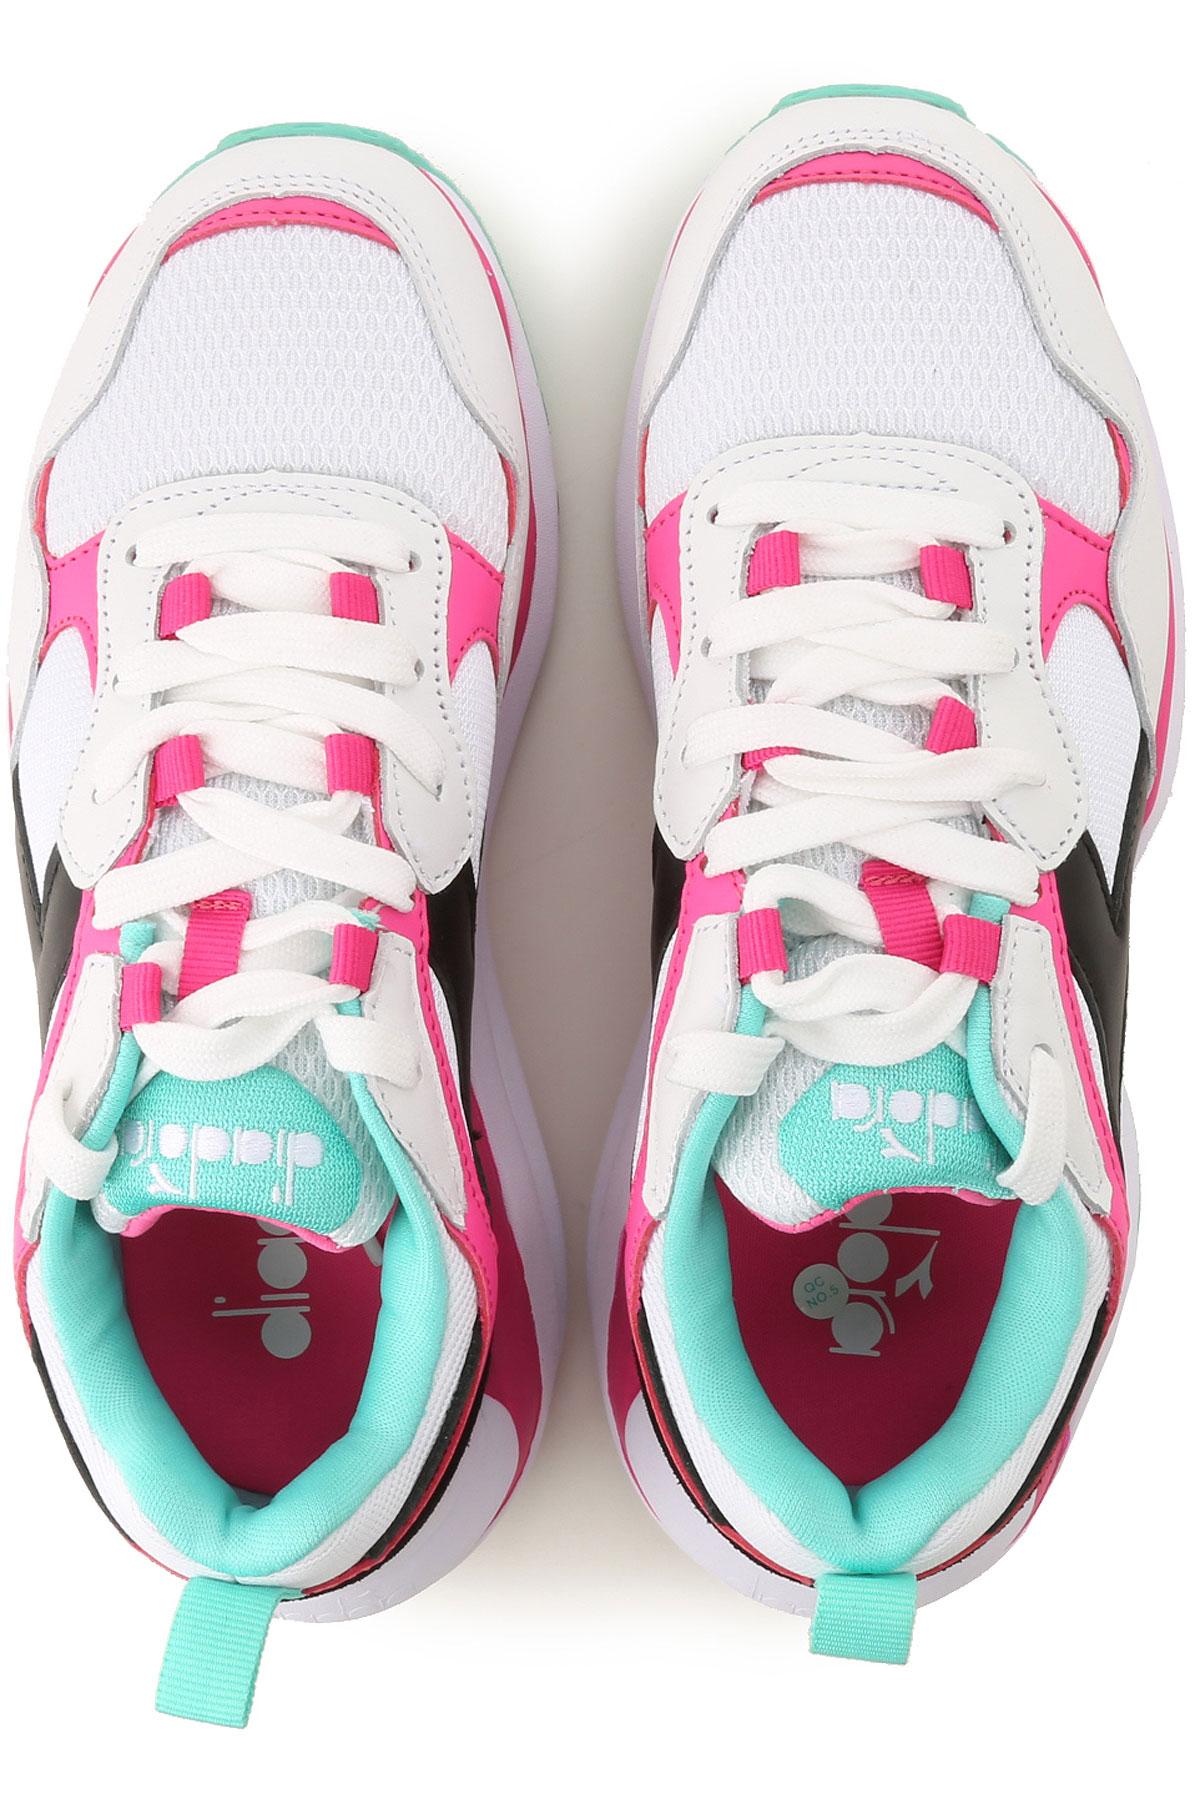 Blanco verano Diadora Fucsia 2019 Zapatos Primavera Para Mujer HwU0Sq